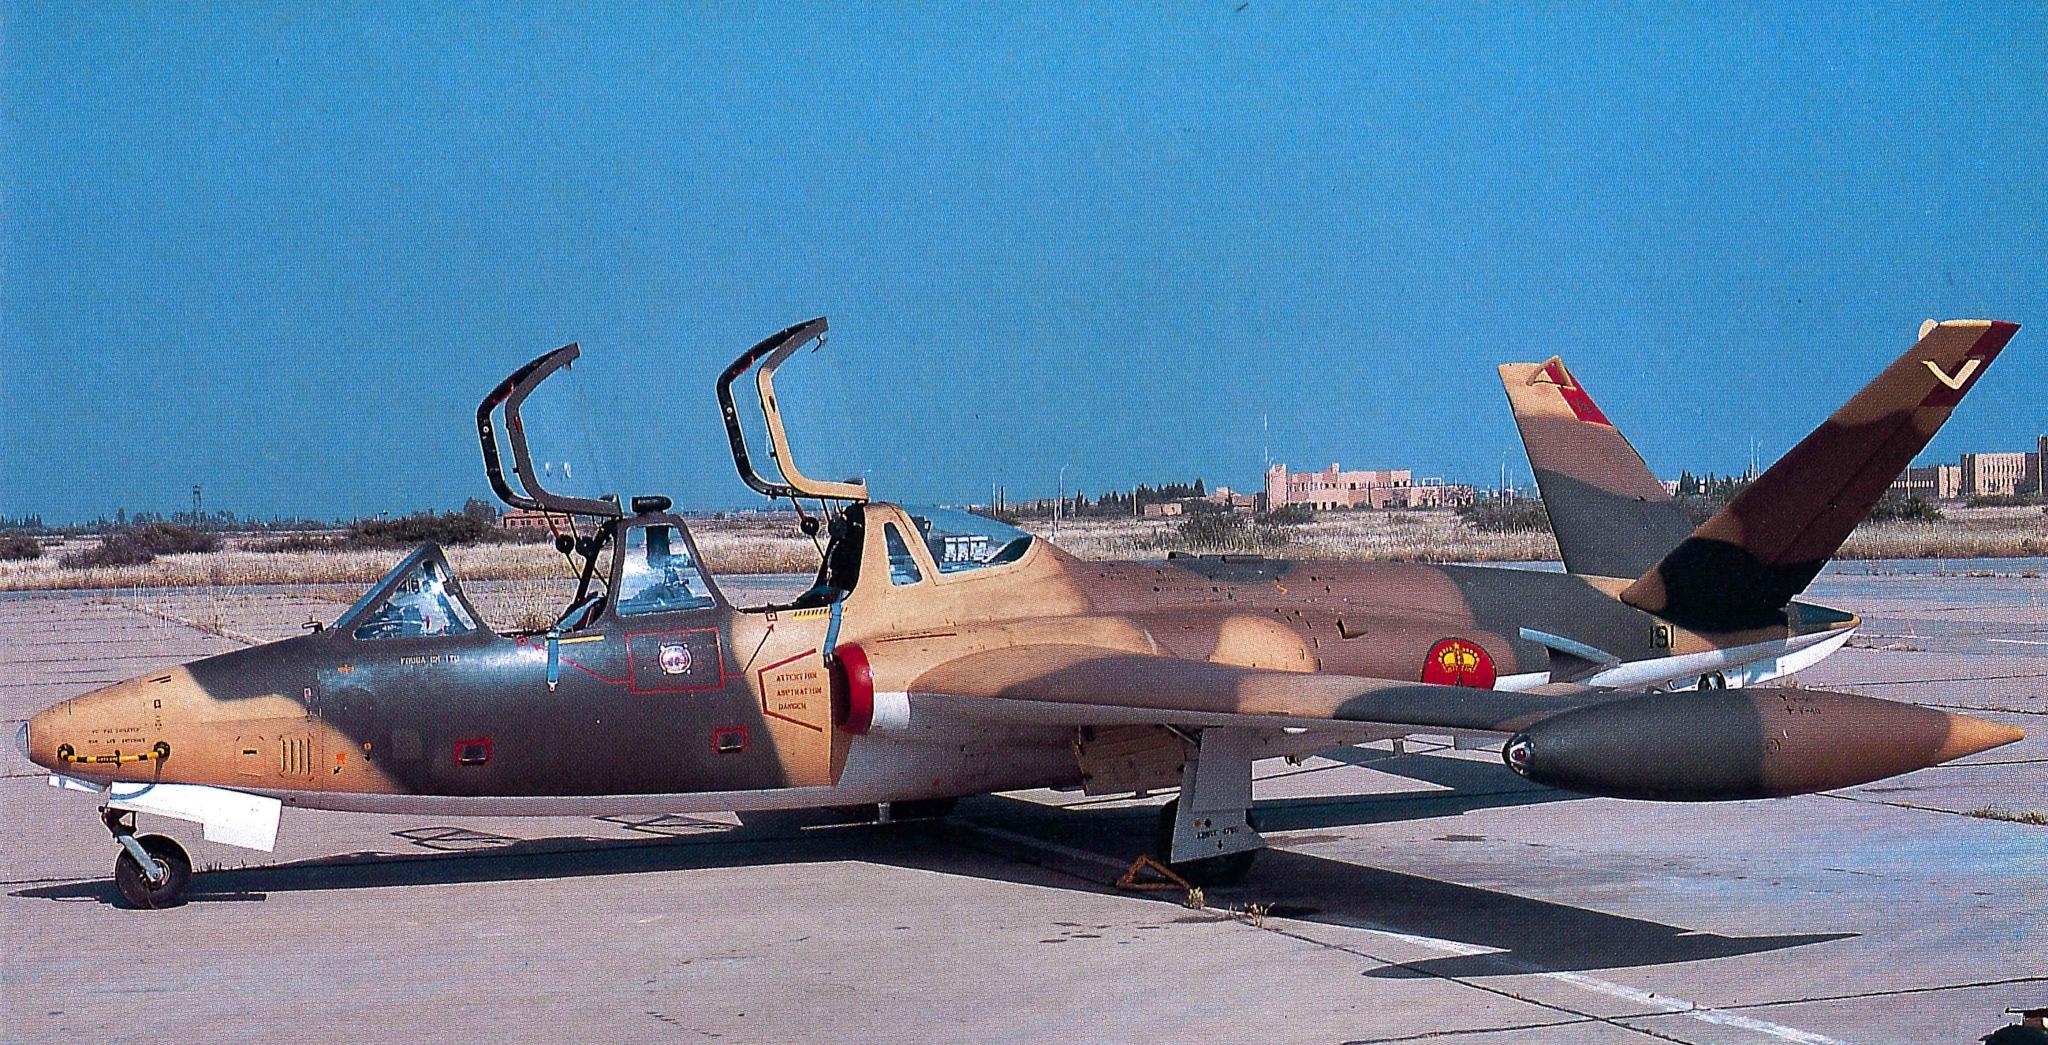 FRA: Photos anciens avions des FRA - Page 12 40055381483_44bbcf04c5_o